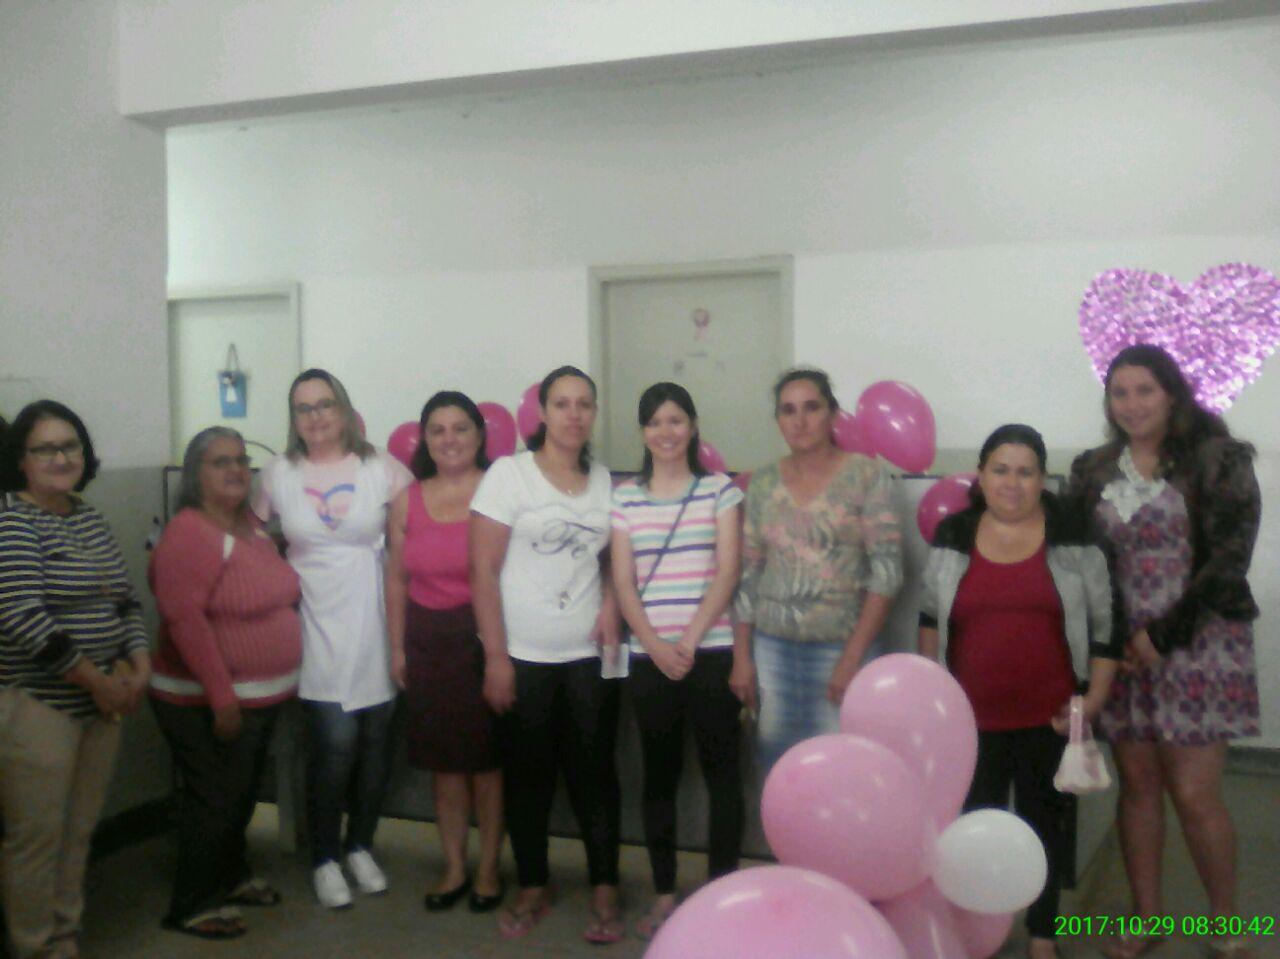 Saúde de Itararé (SP) promove o 'Domingo Rosa'